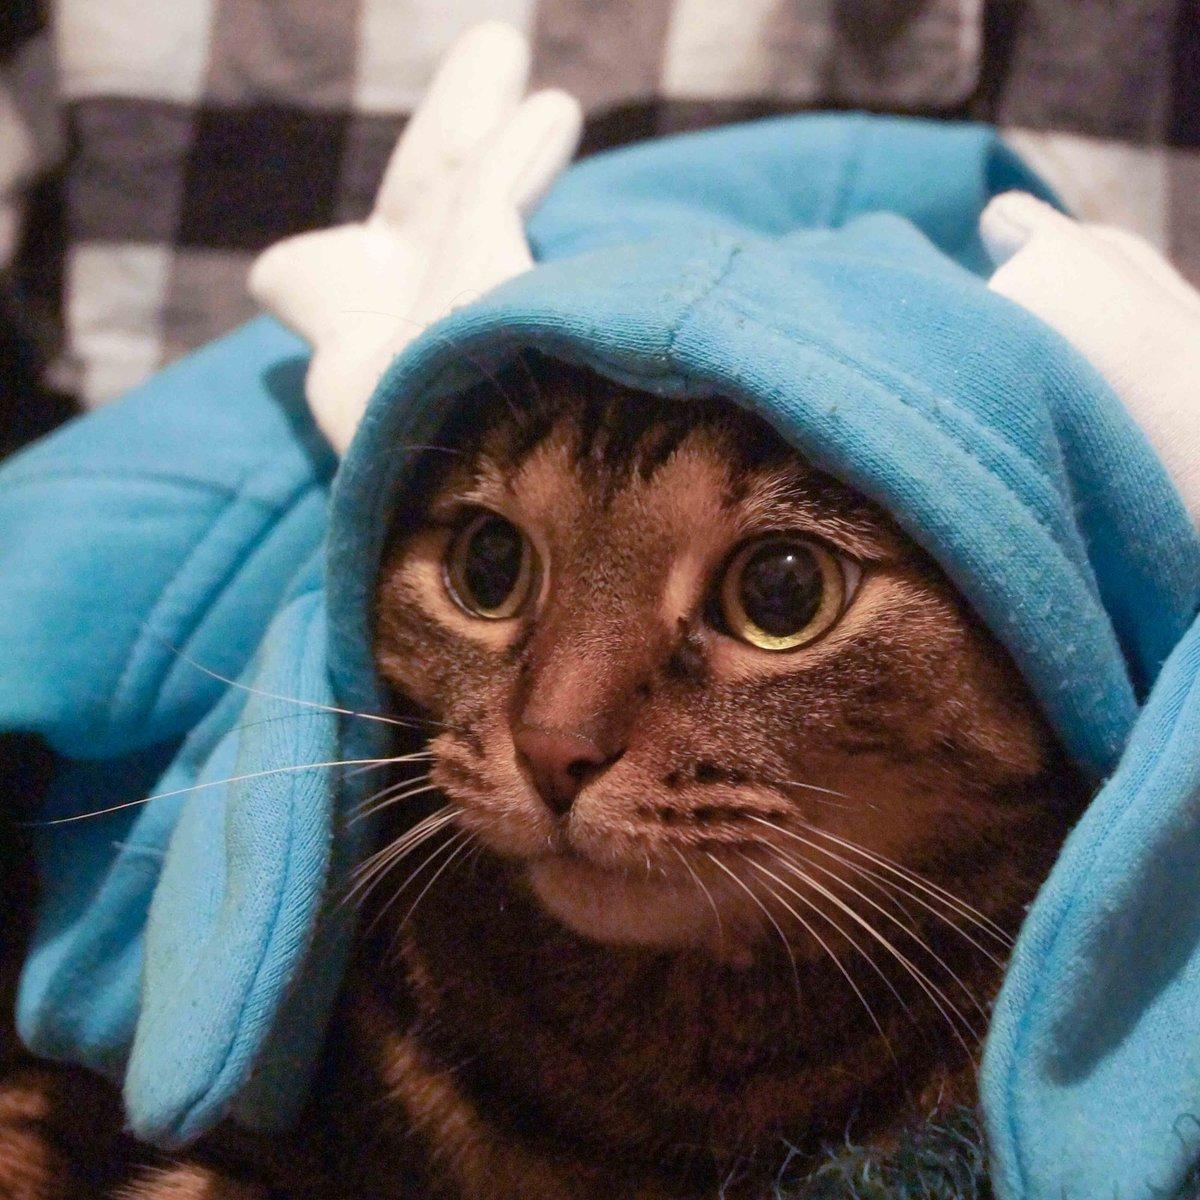 Amy Lee On Twitter 83 Angel Is A Blue Reindeer Angel Cat Kitty Kittycat Reindeer Blue Cute Adorable Baby Beauty Beautiful Pretty Girl Wonderful Precious Sweetie Cool Babygirl Cutecat Deer Christmas Xmas